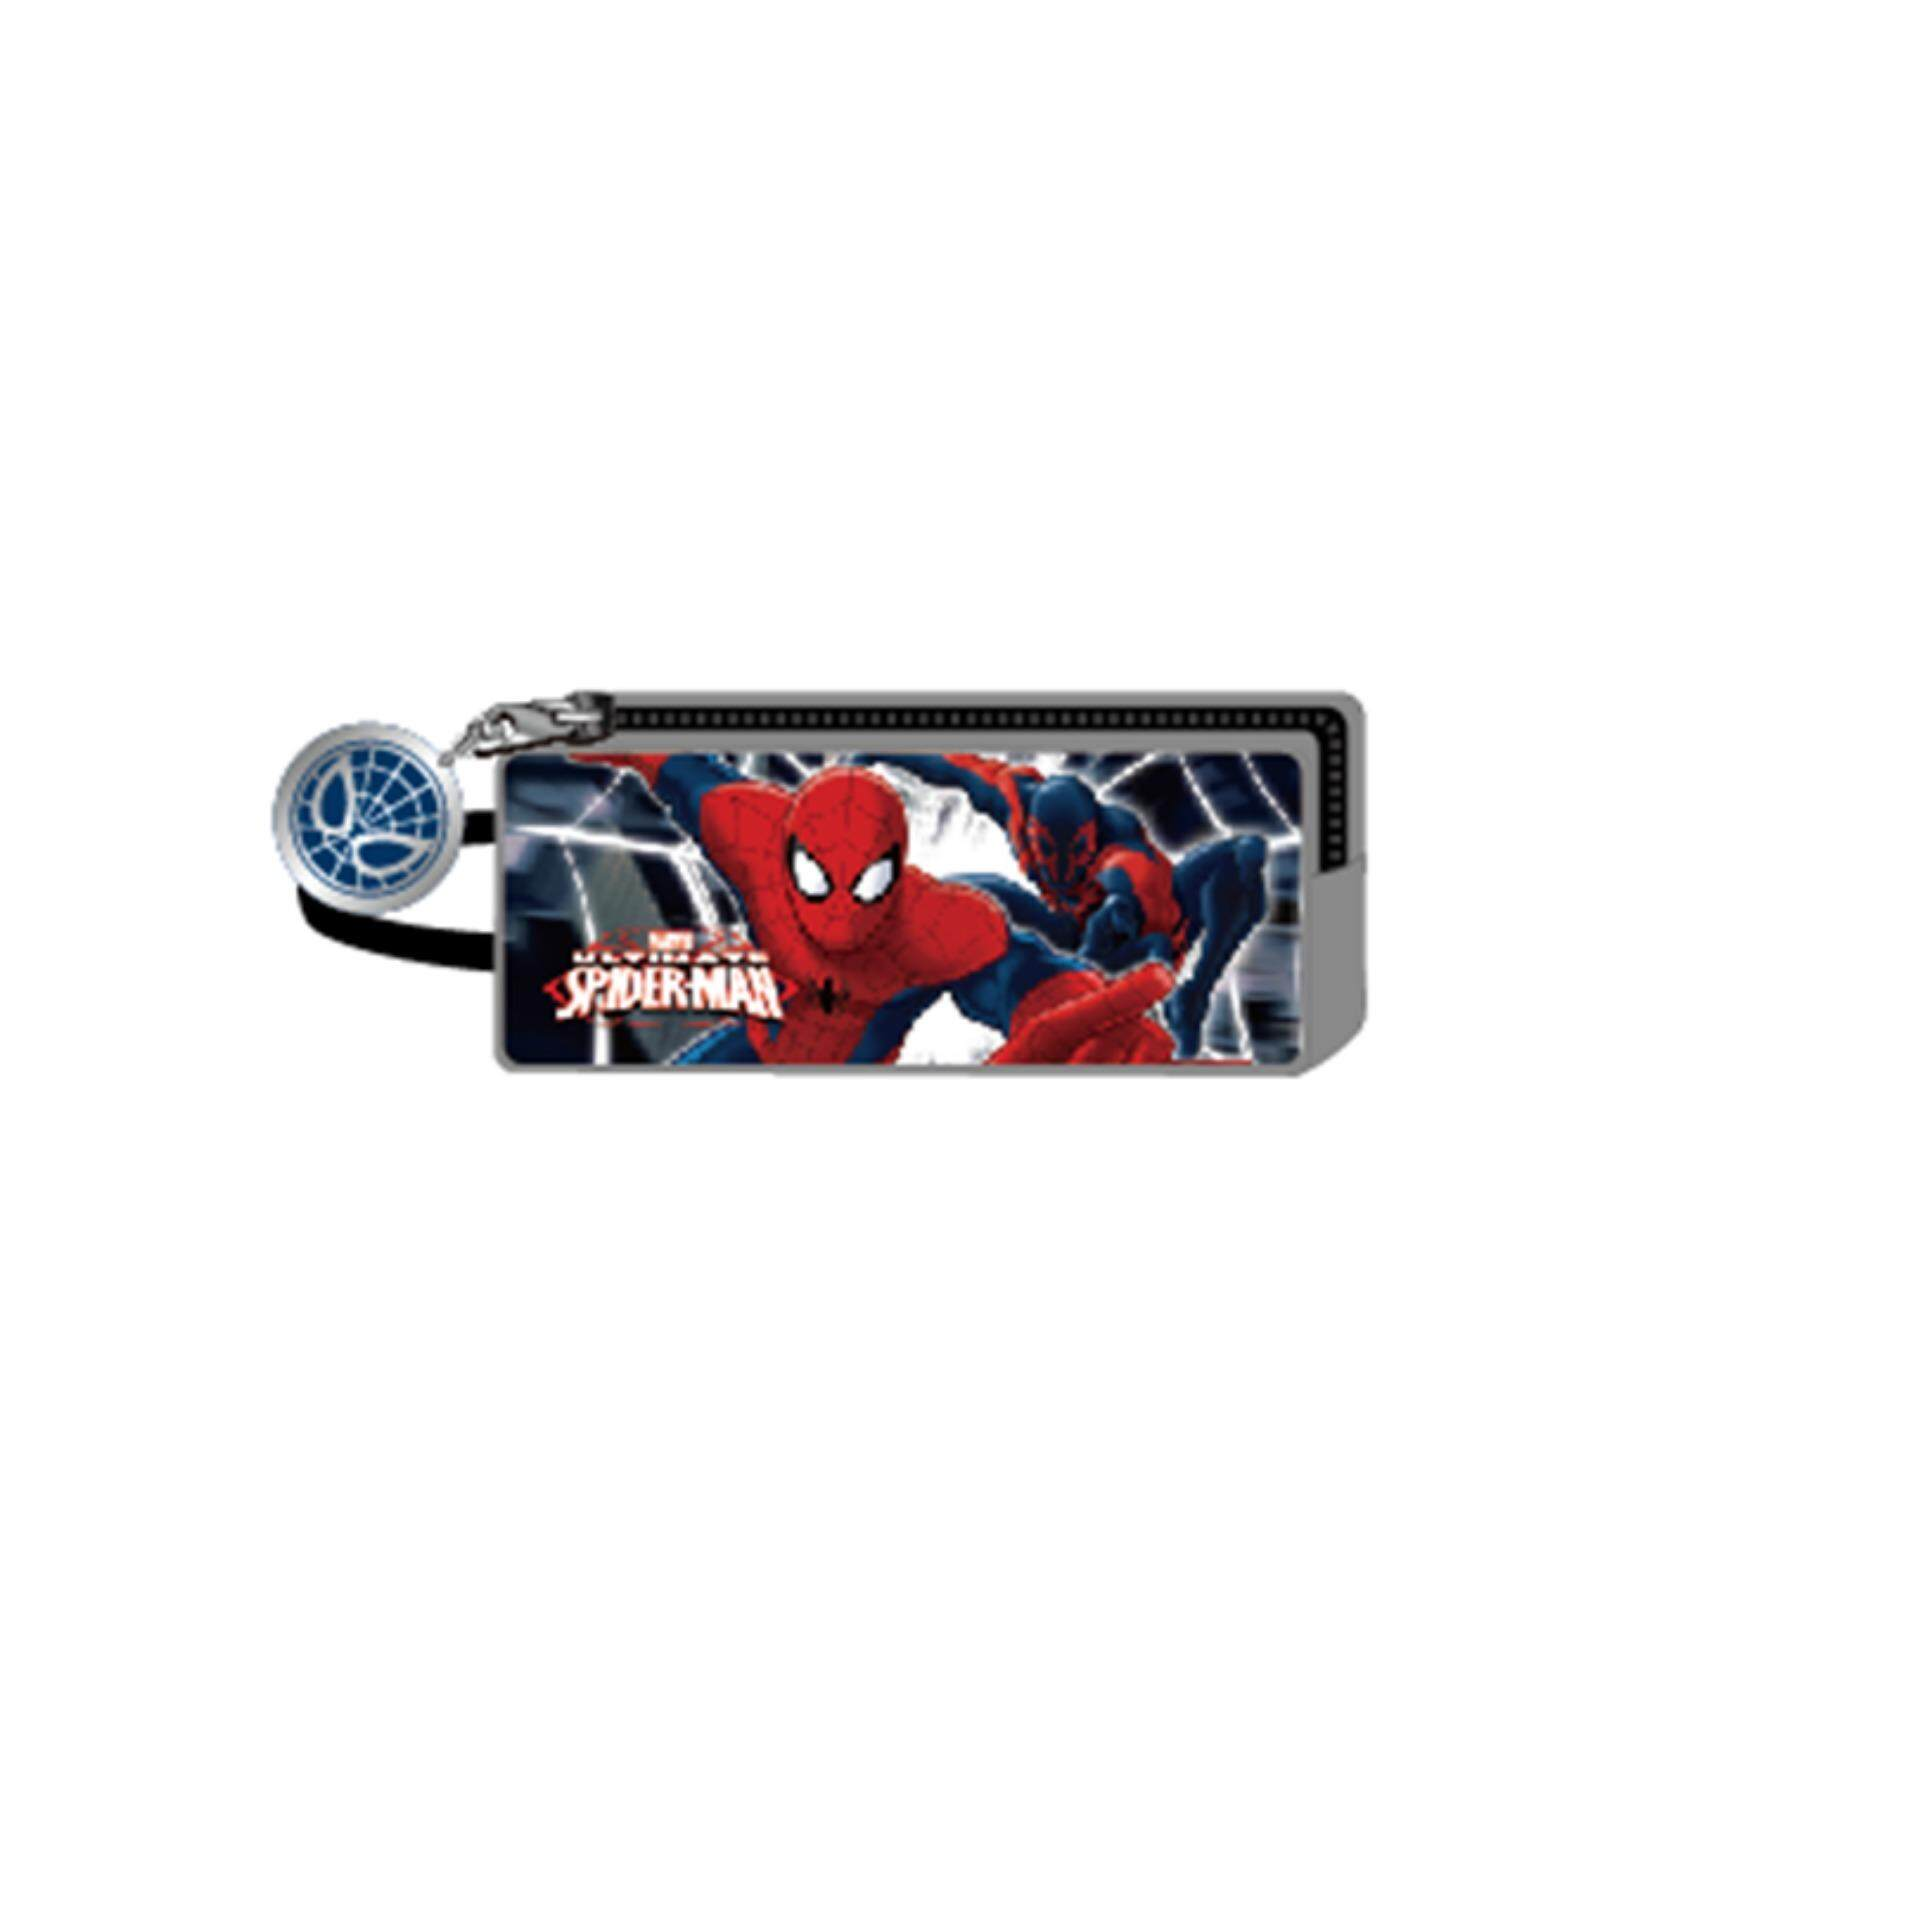 Marvel Buy At Best Price In Malaysia Katalig Baji Kaptem Amerika Spiderman Rectangular Pencil Pouch Grey Colour